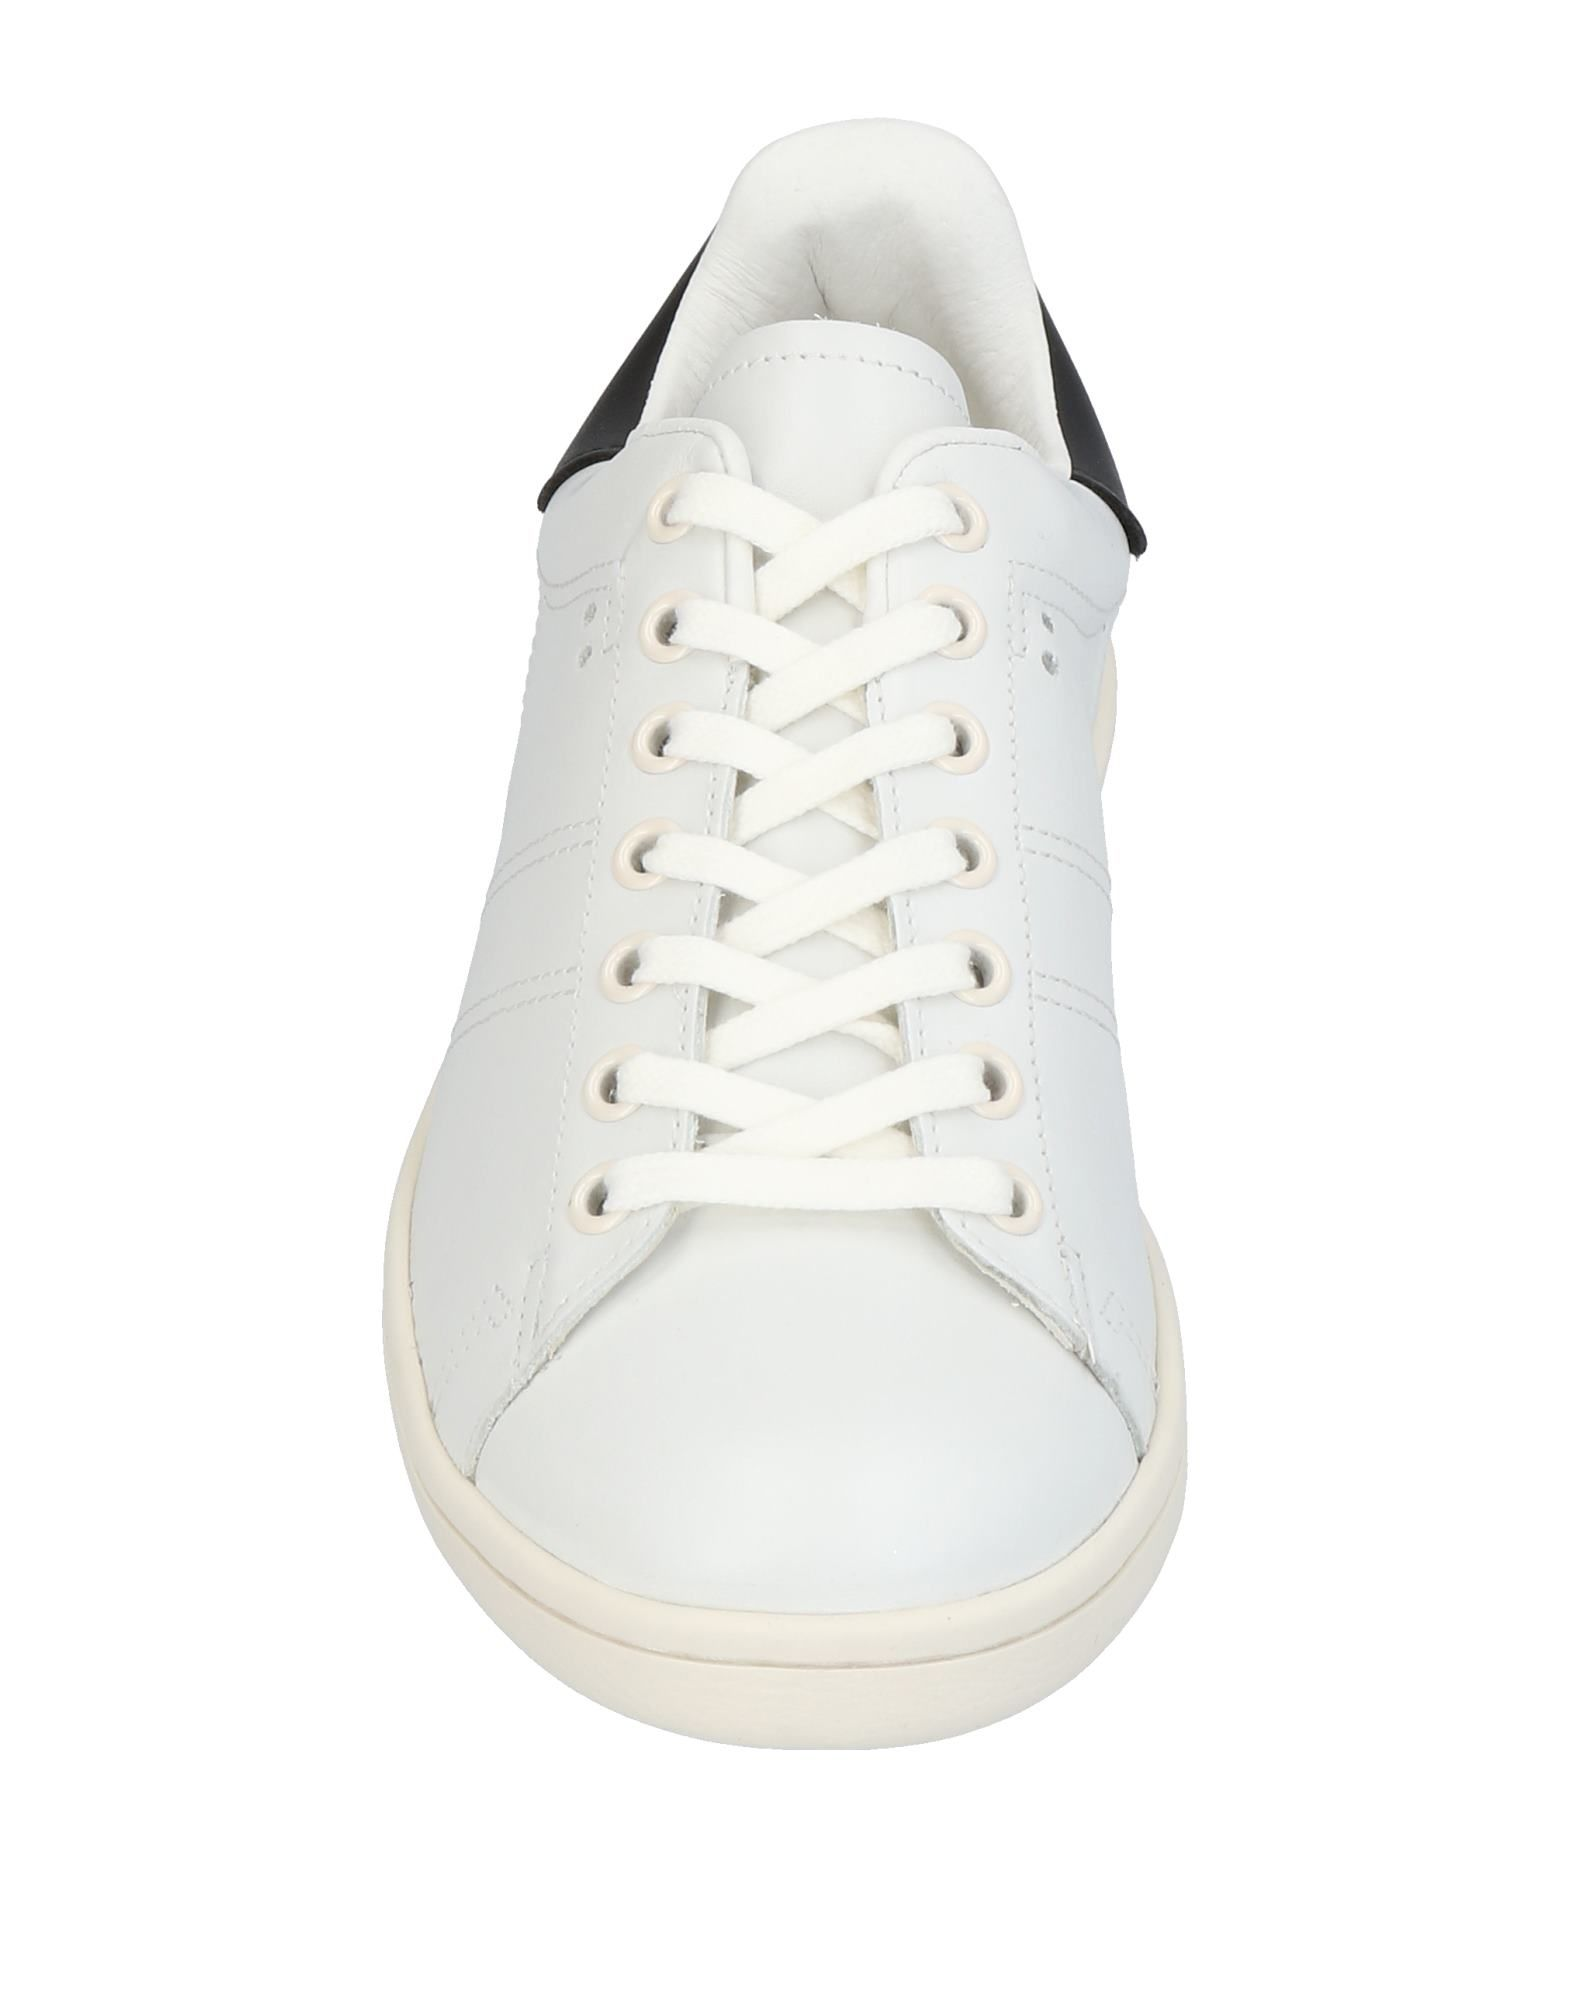 Isabel Marant Étoile Sneakers Damen  11416295ULGut aussehende strapazierfähige Schuhe